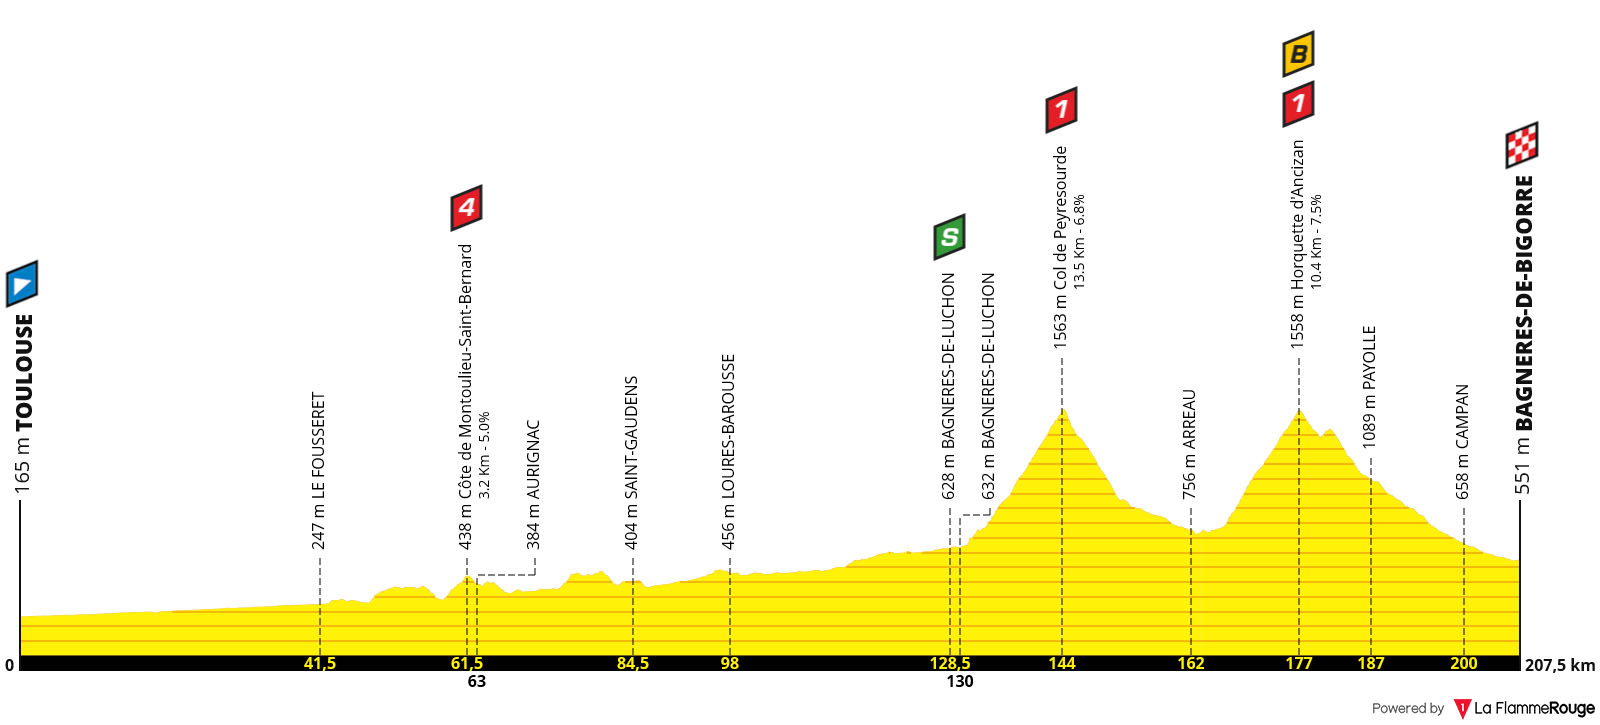 Perfil Etapa 12 - Tour de Francia 2019